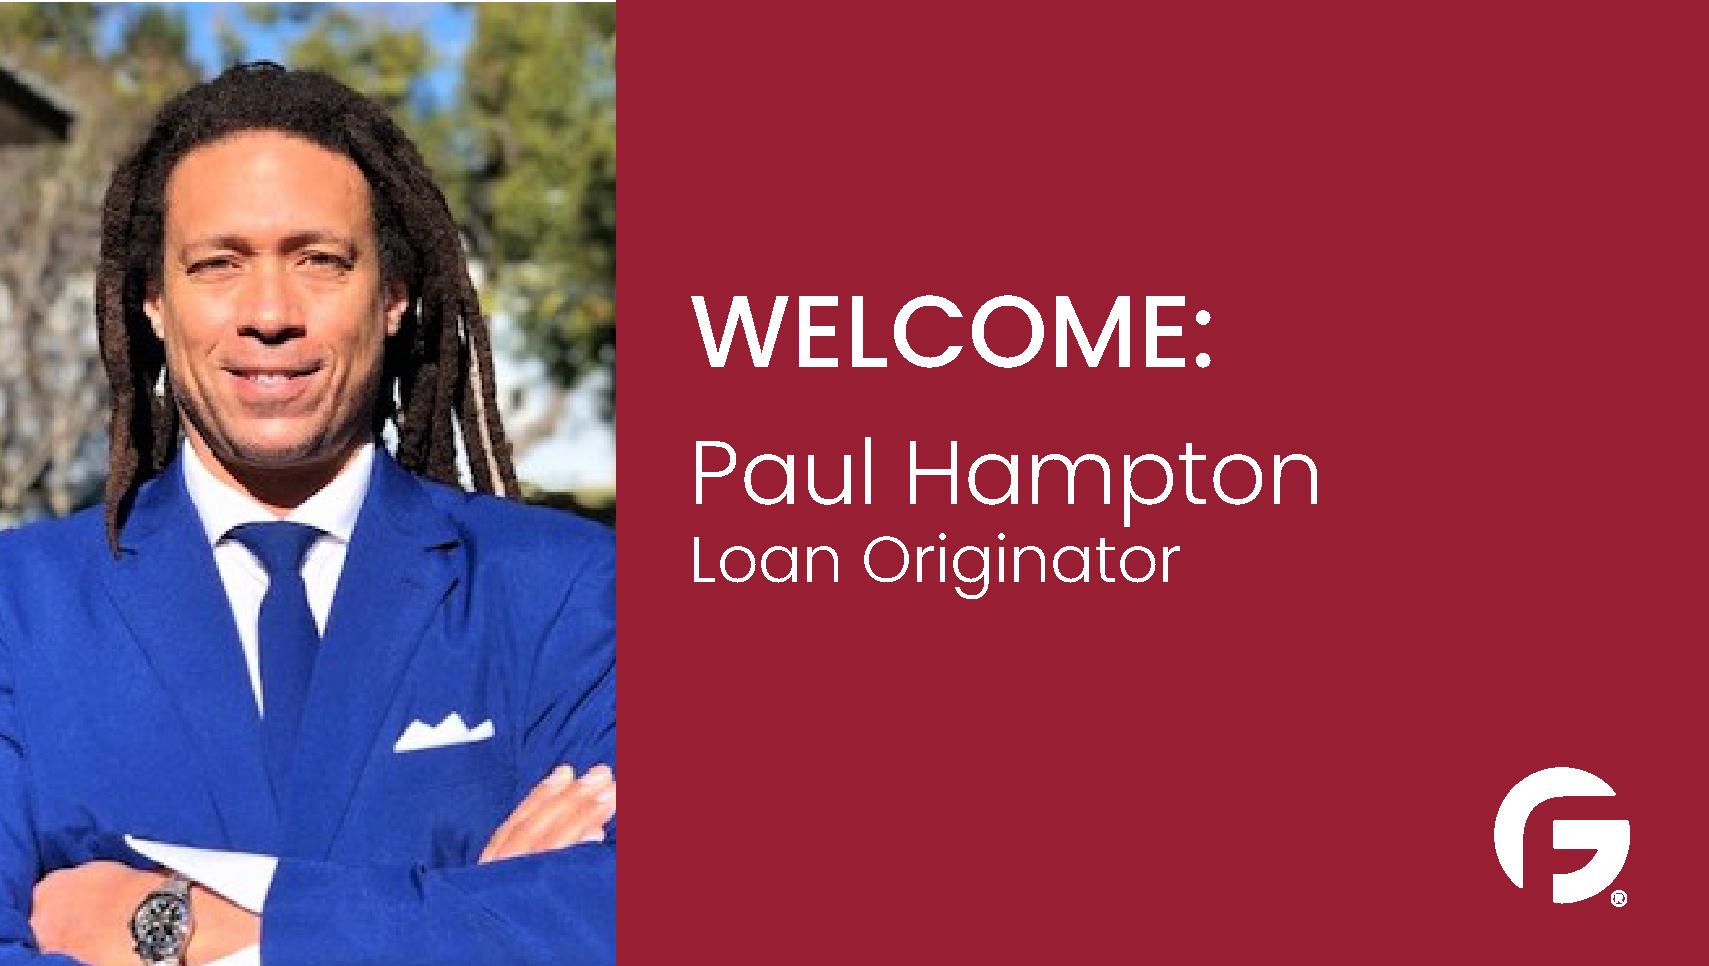 Paul Hampton, Loan Originator, serving California